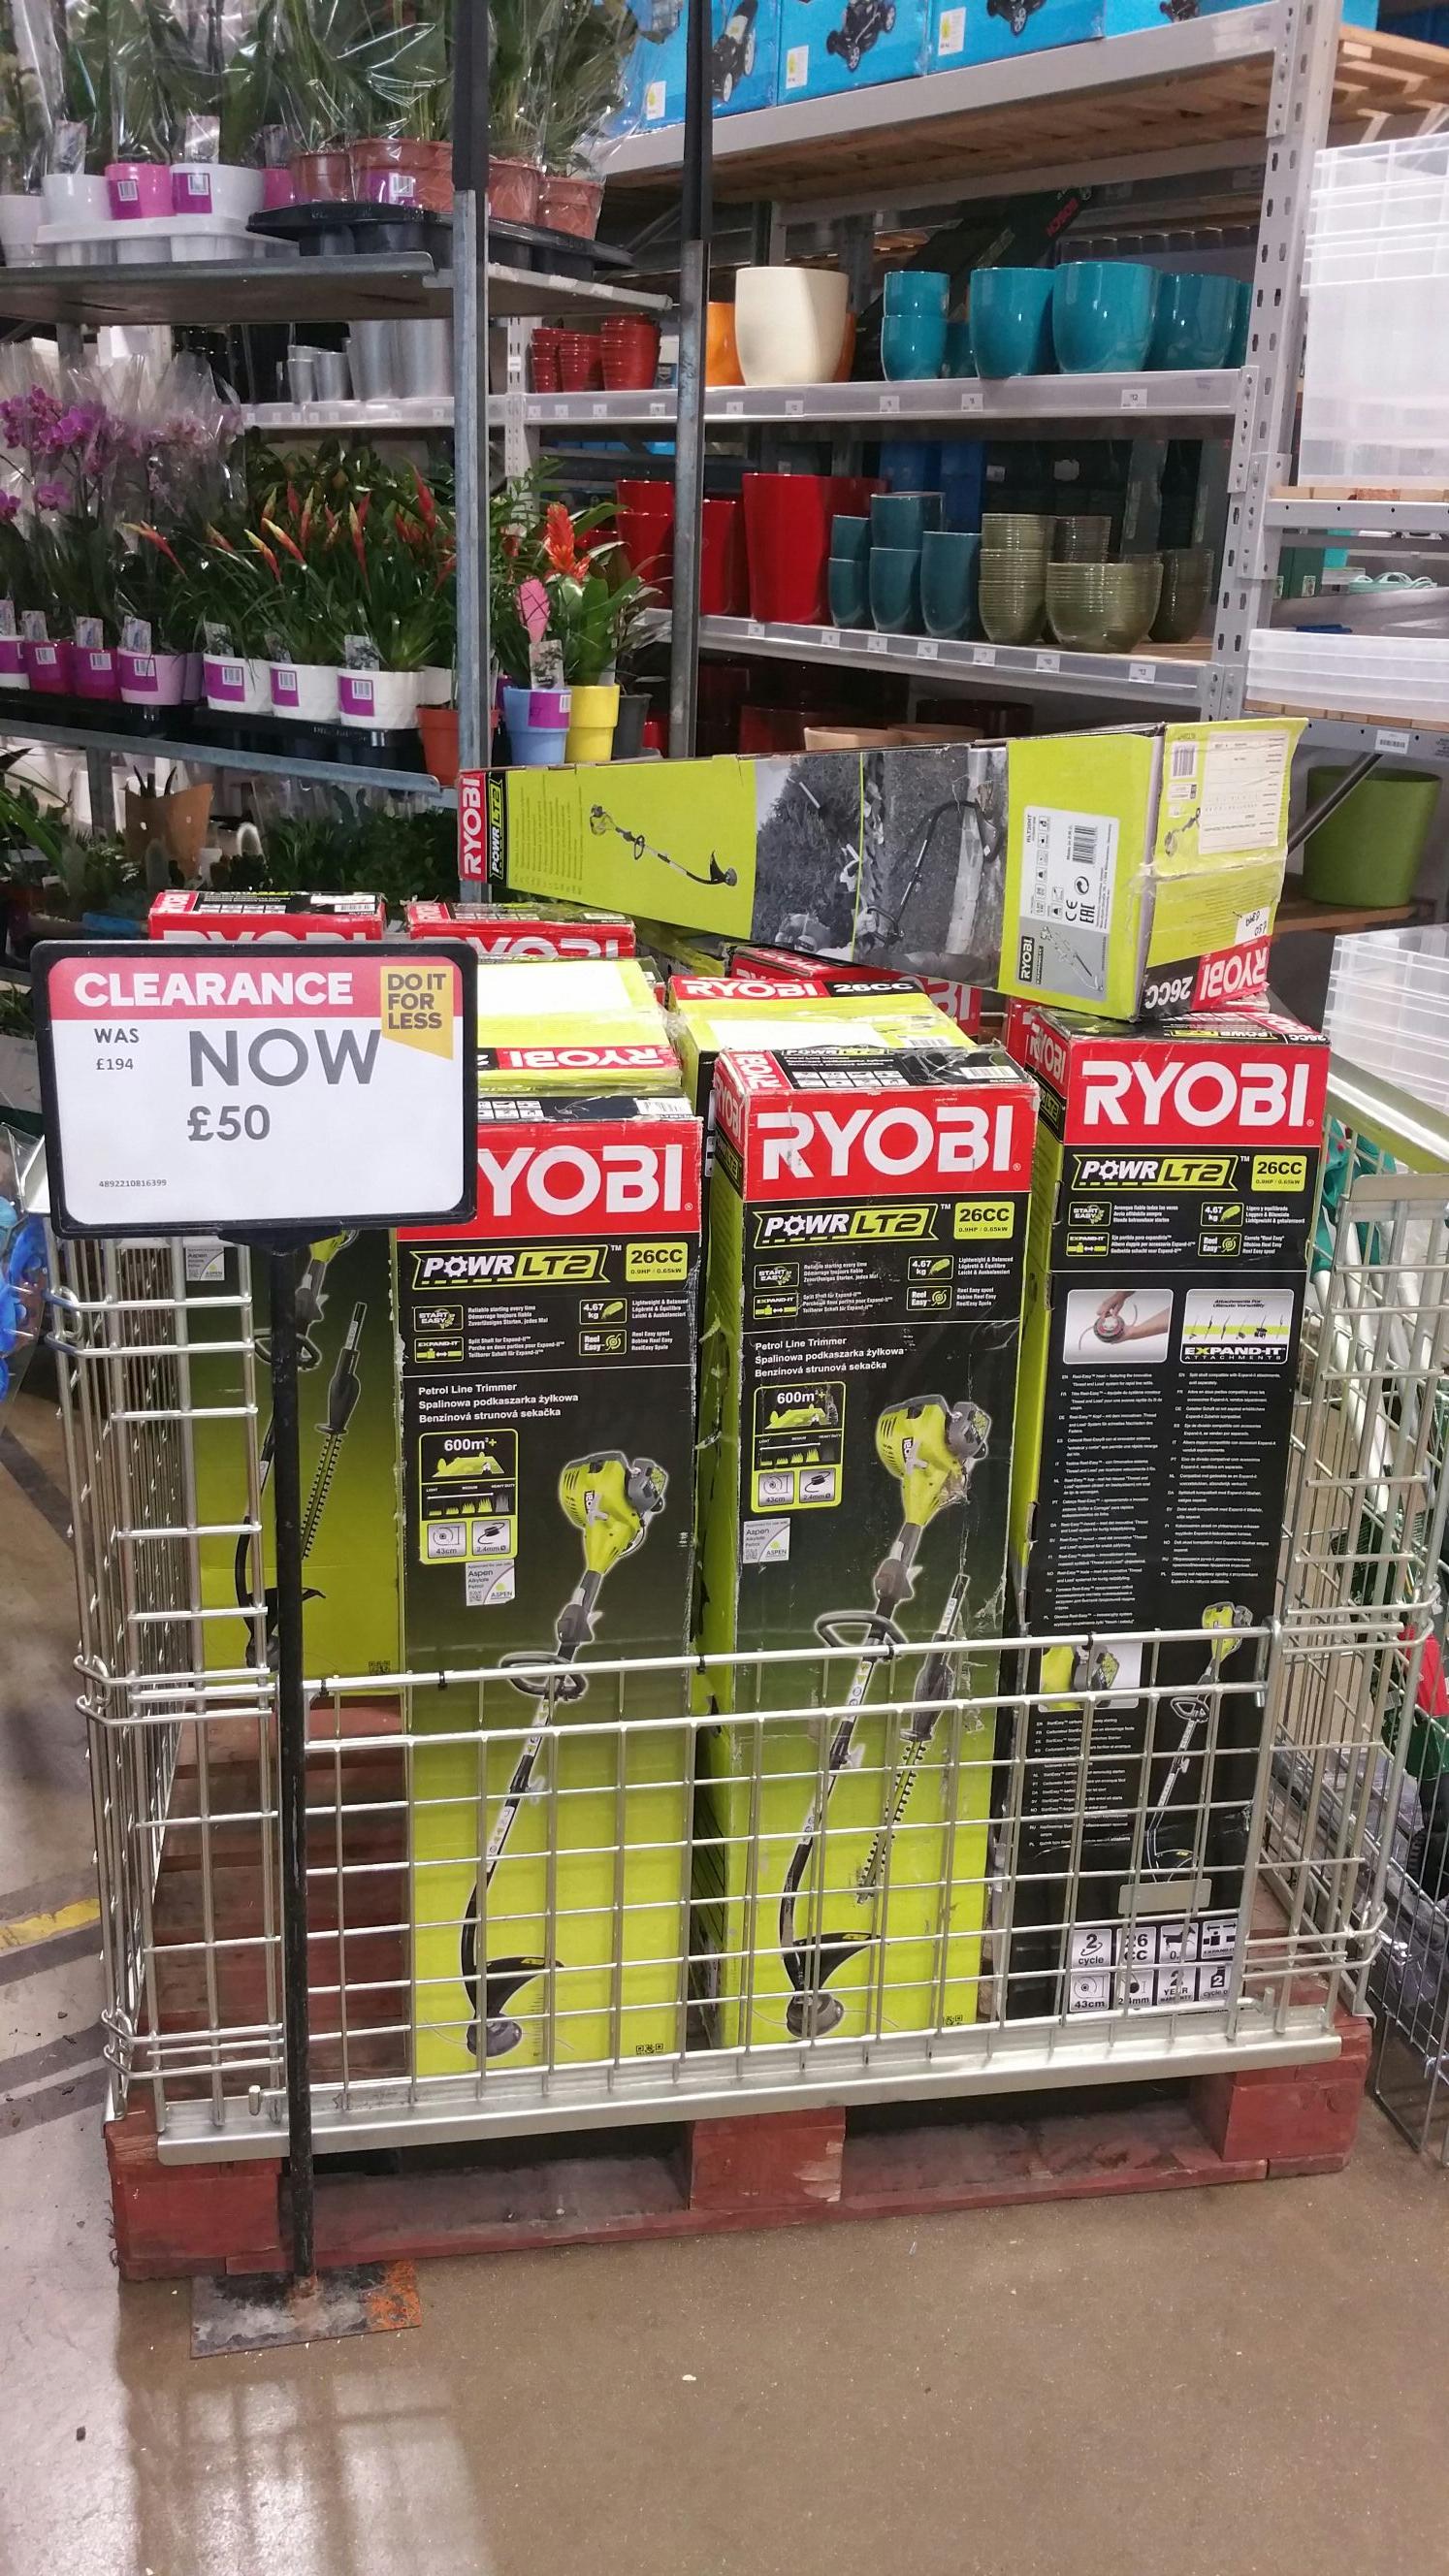 Ryobi RLT26HT 26 cc Petrol Grass trimmer & hedge trimmer kit instore at B&Q for £50